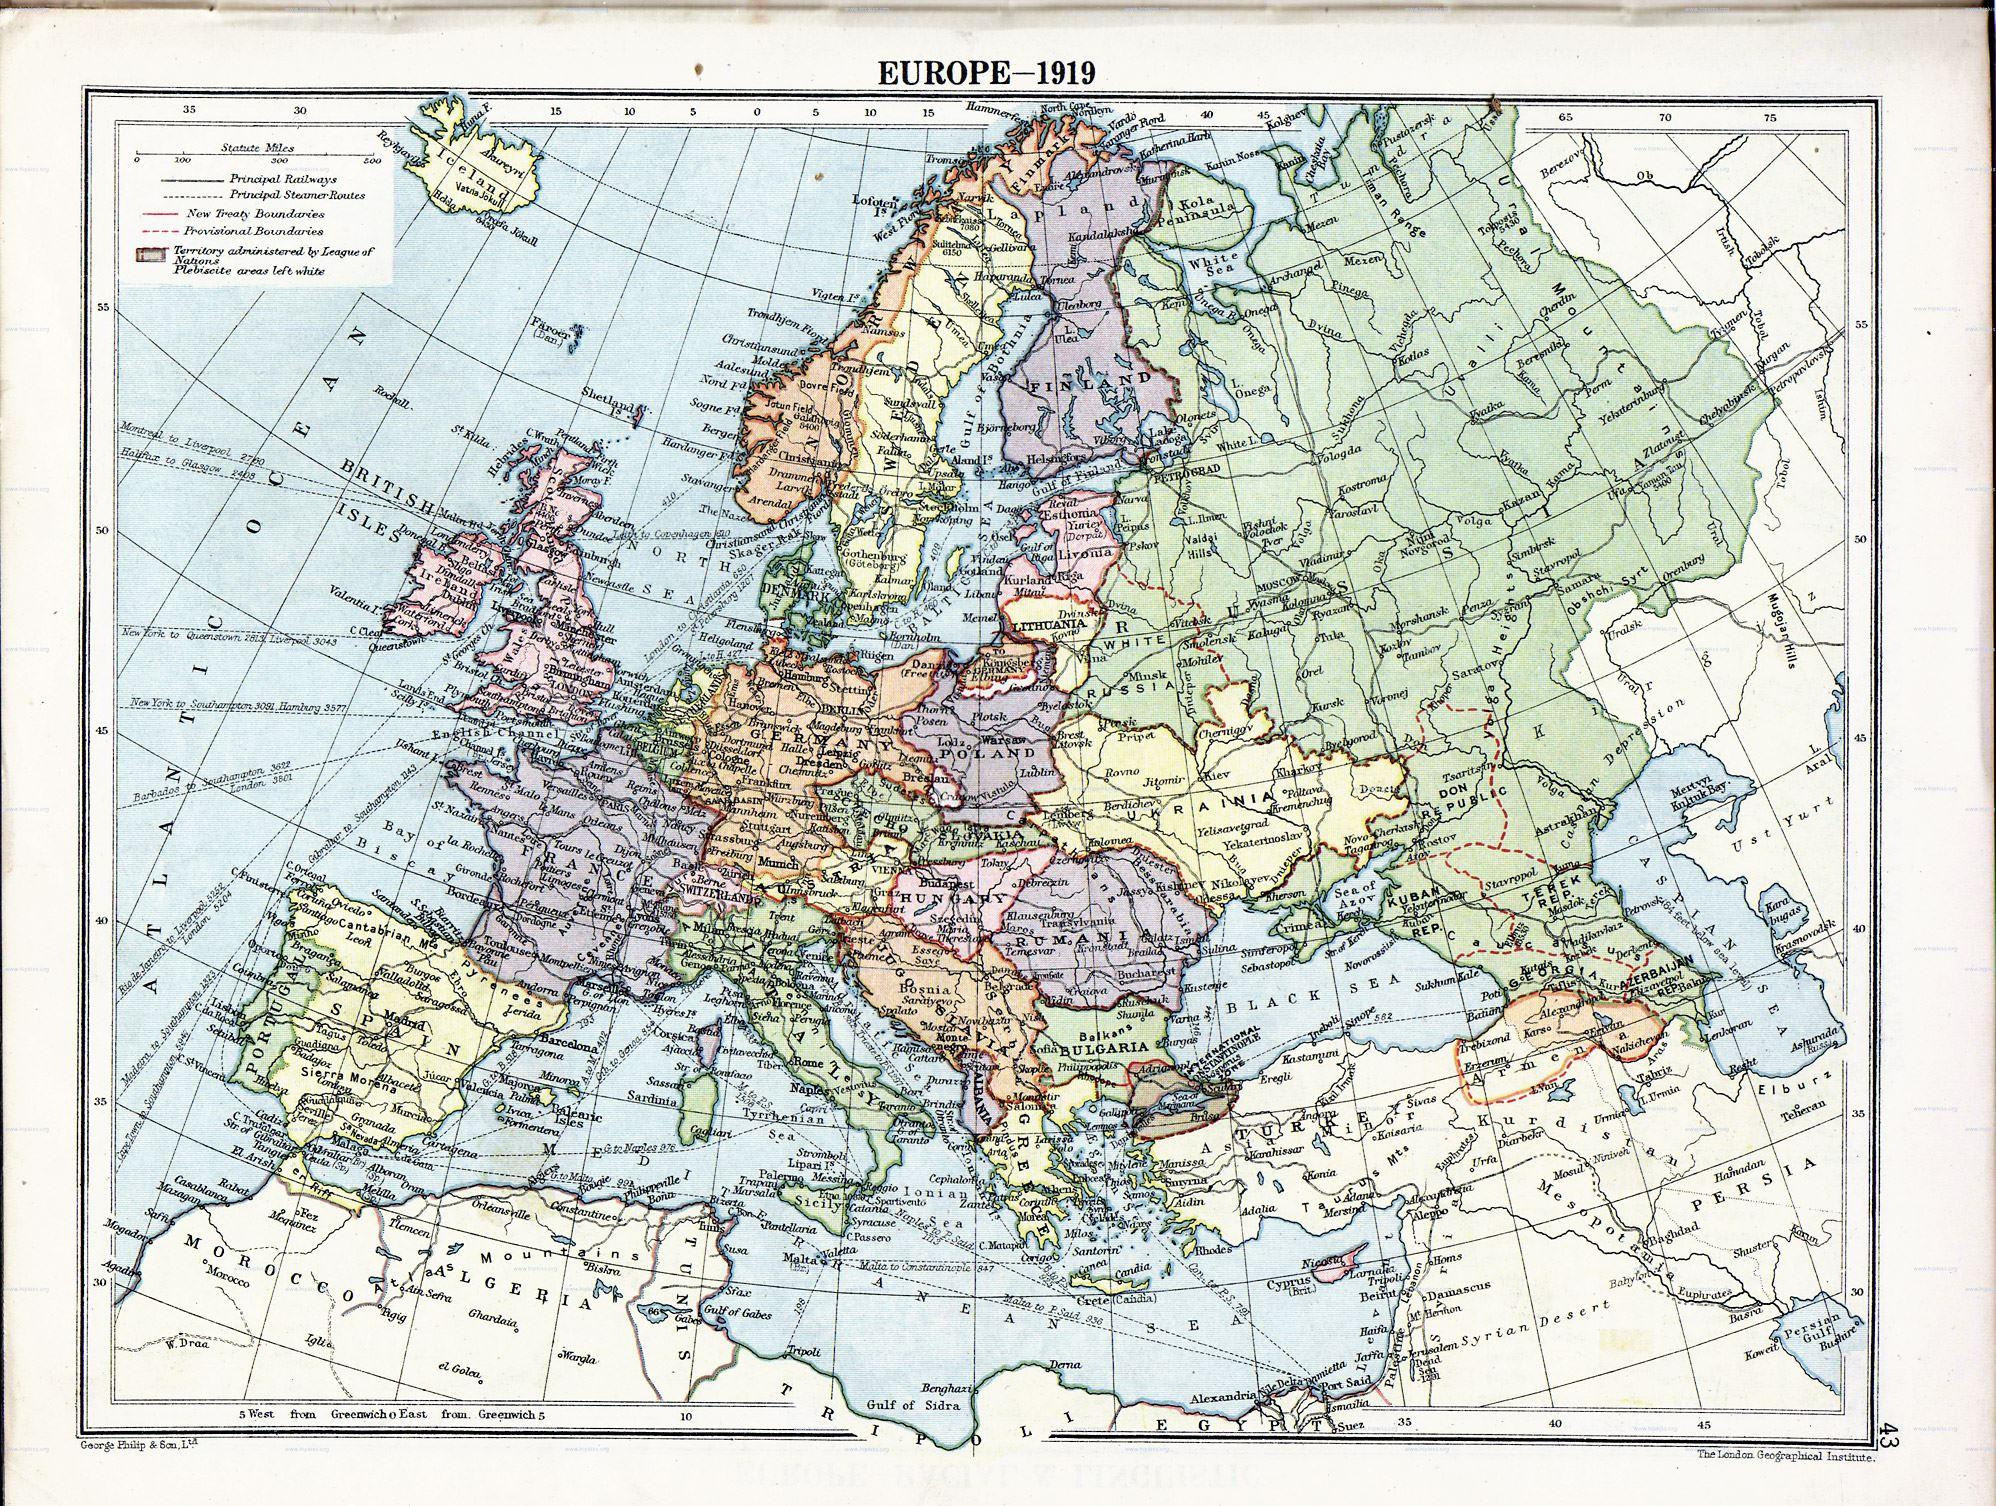 058-europe1919